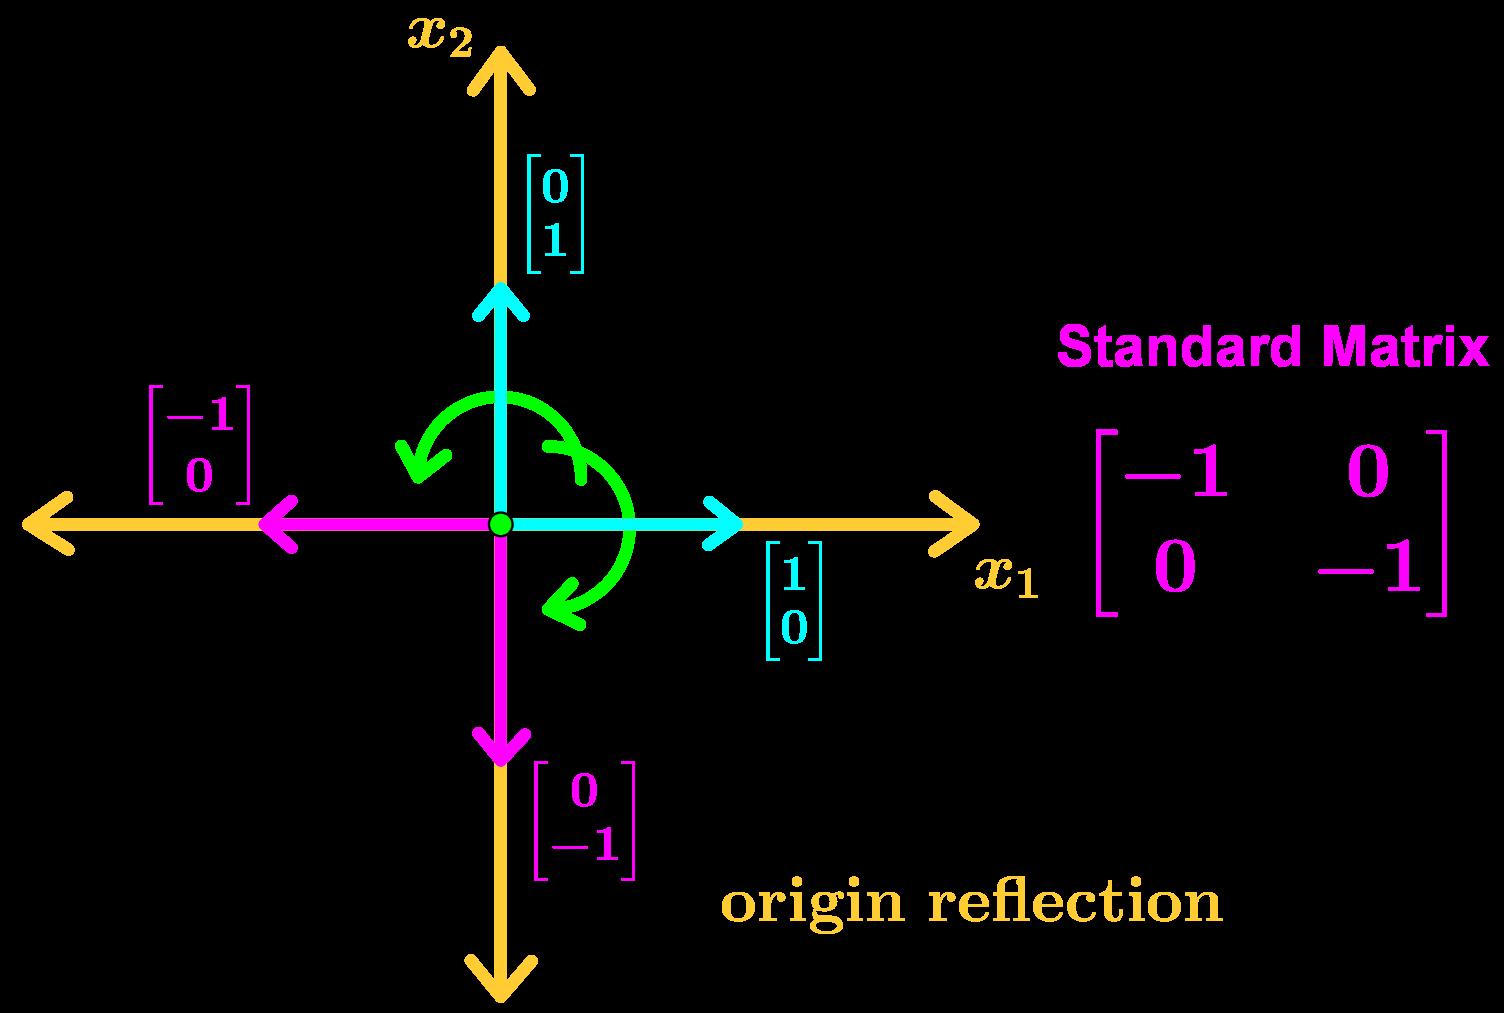 origin reflection